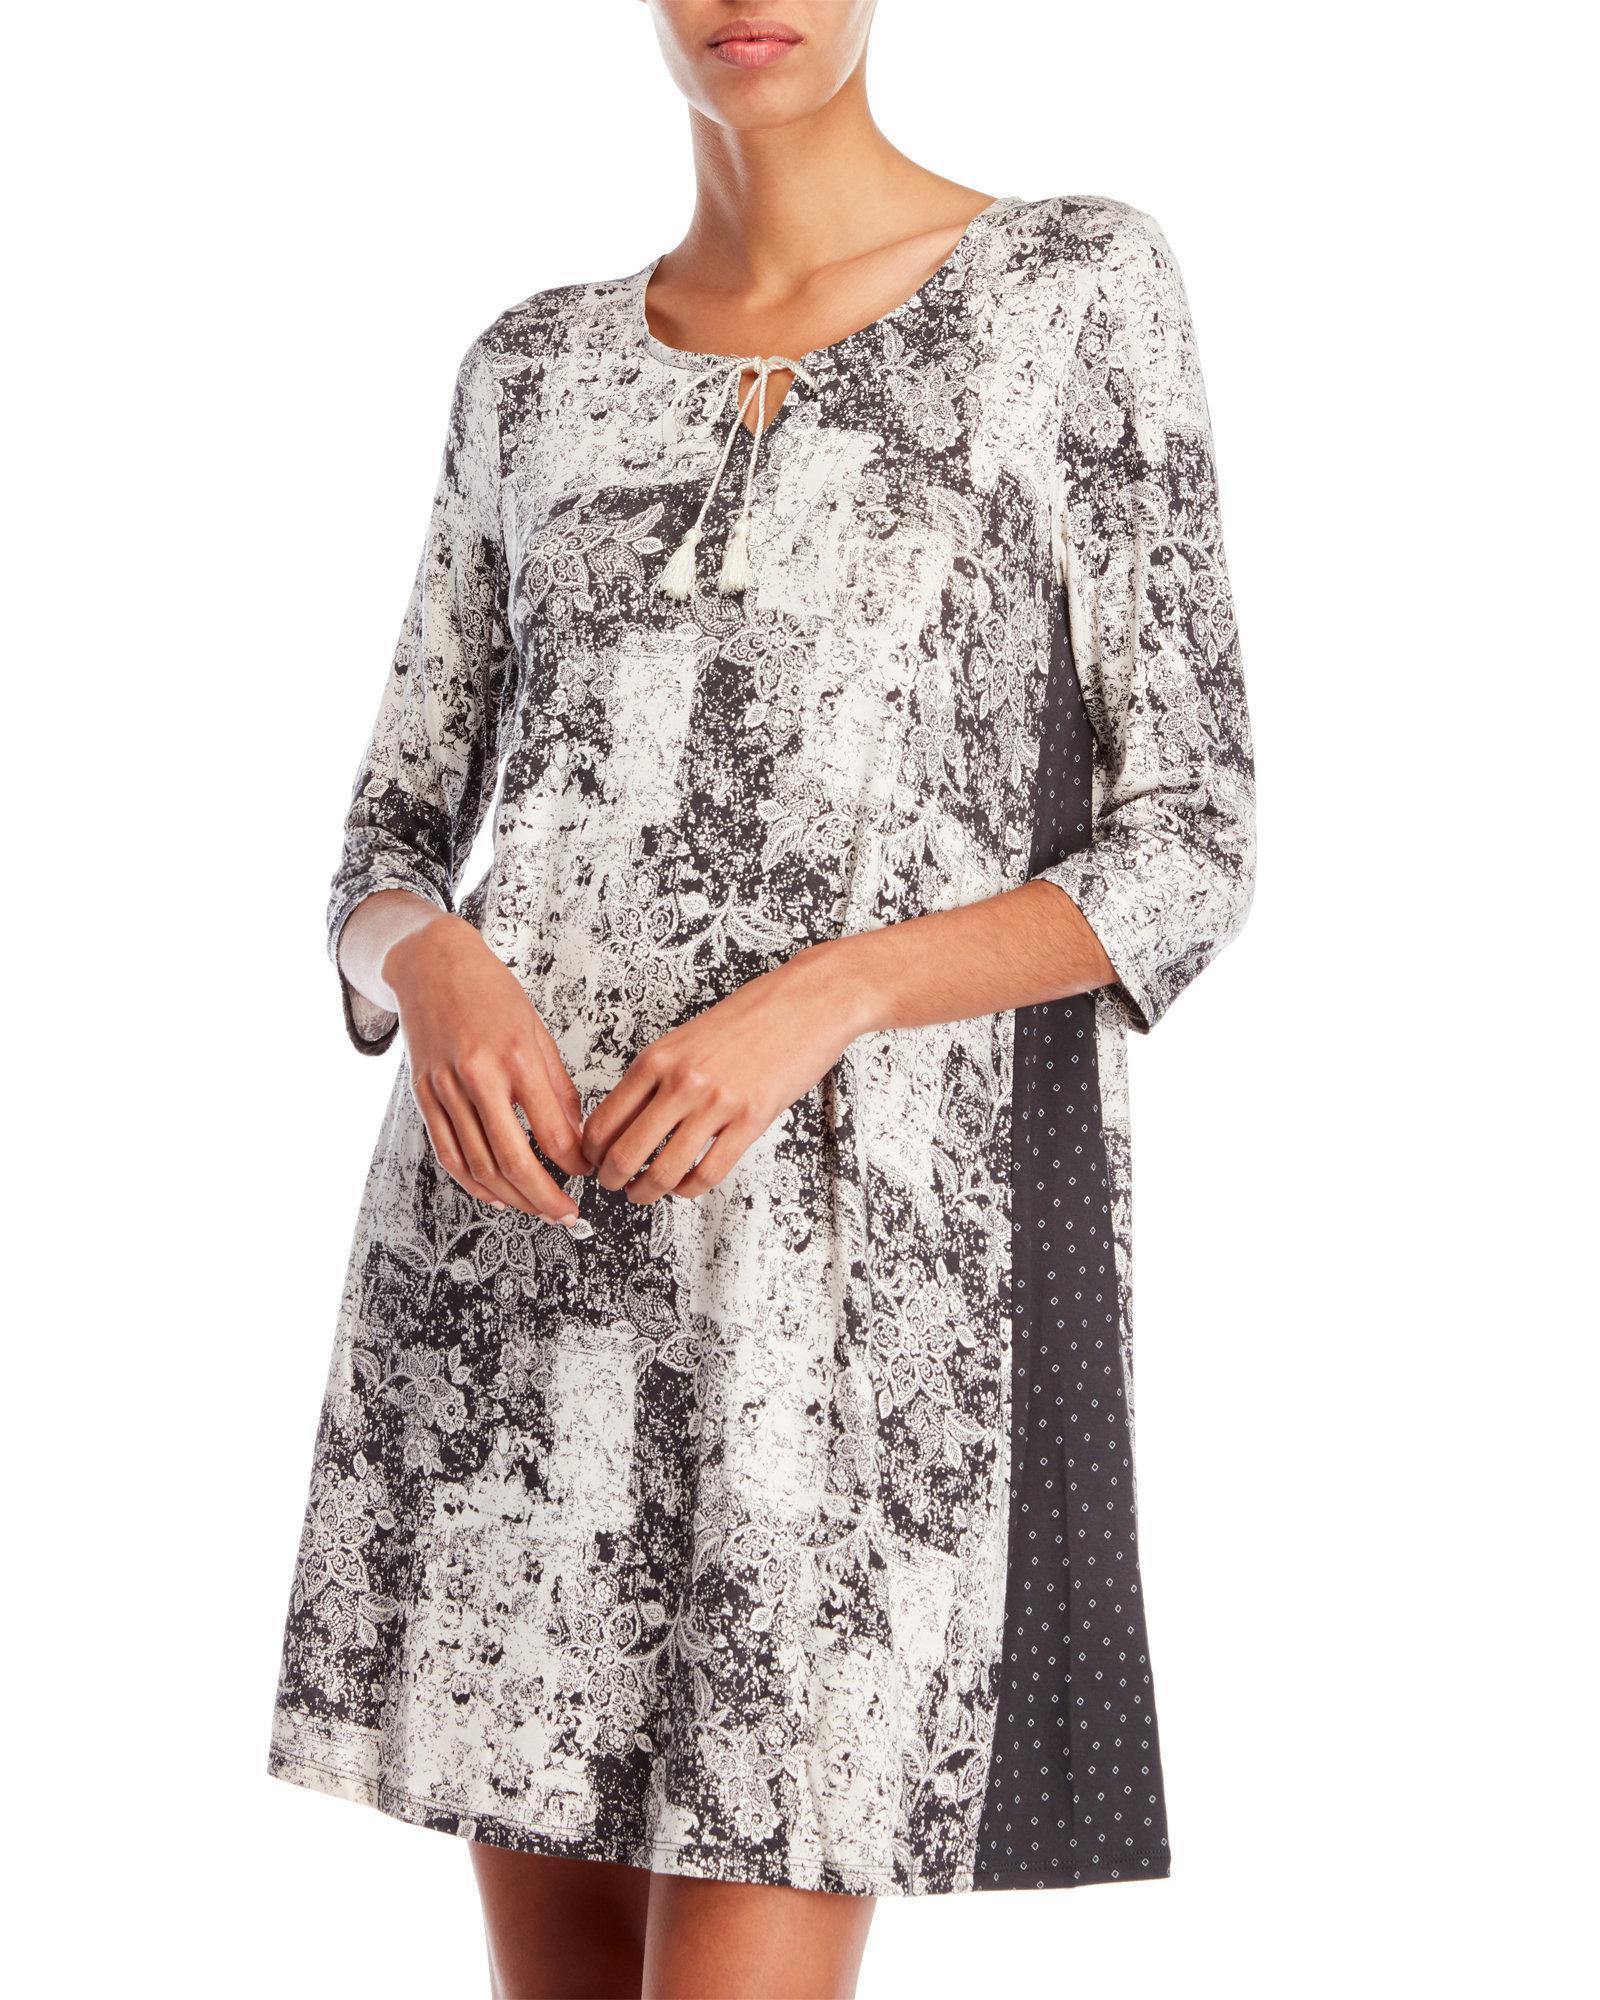 26514c33461 Lyst - Ellen Tracy Tassel Sleep Shirt in Gray